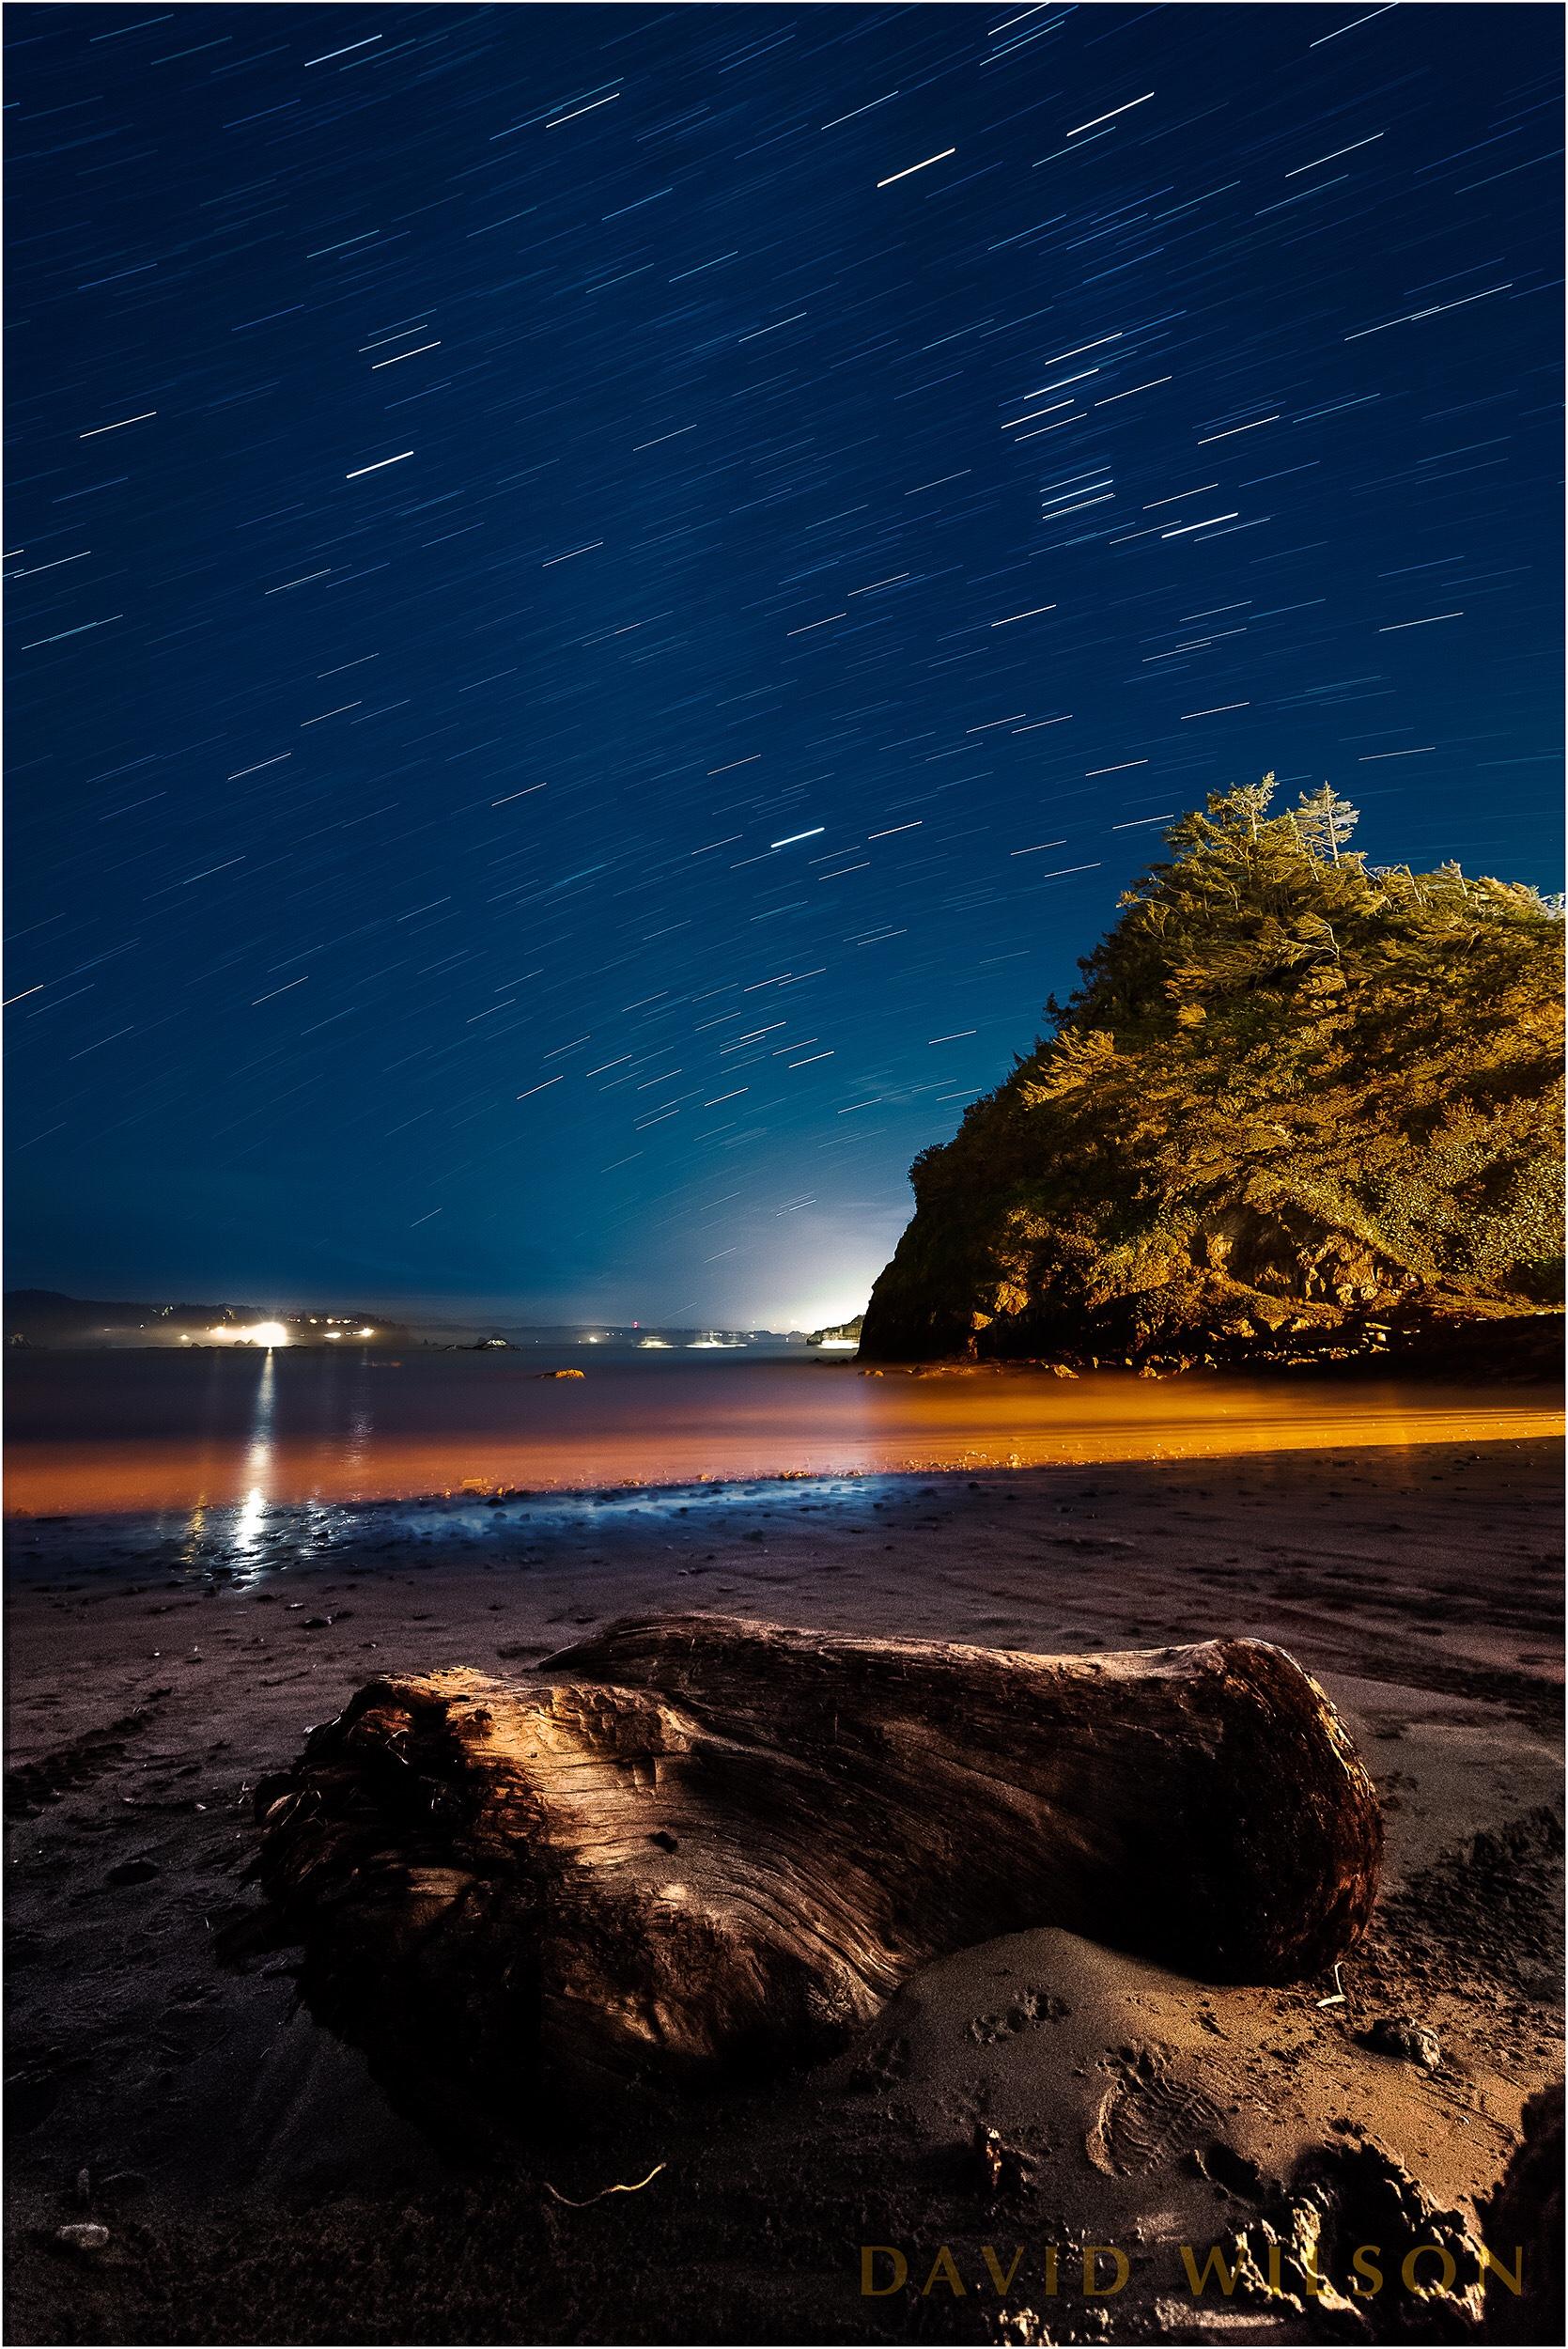 Star trails above Boat Launch Beach, Trinidad, California.